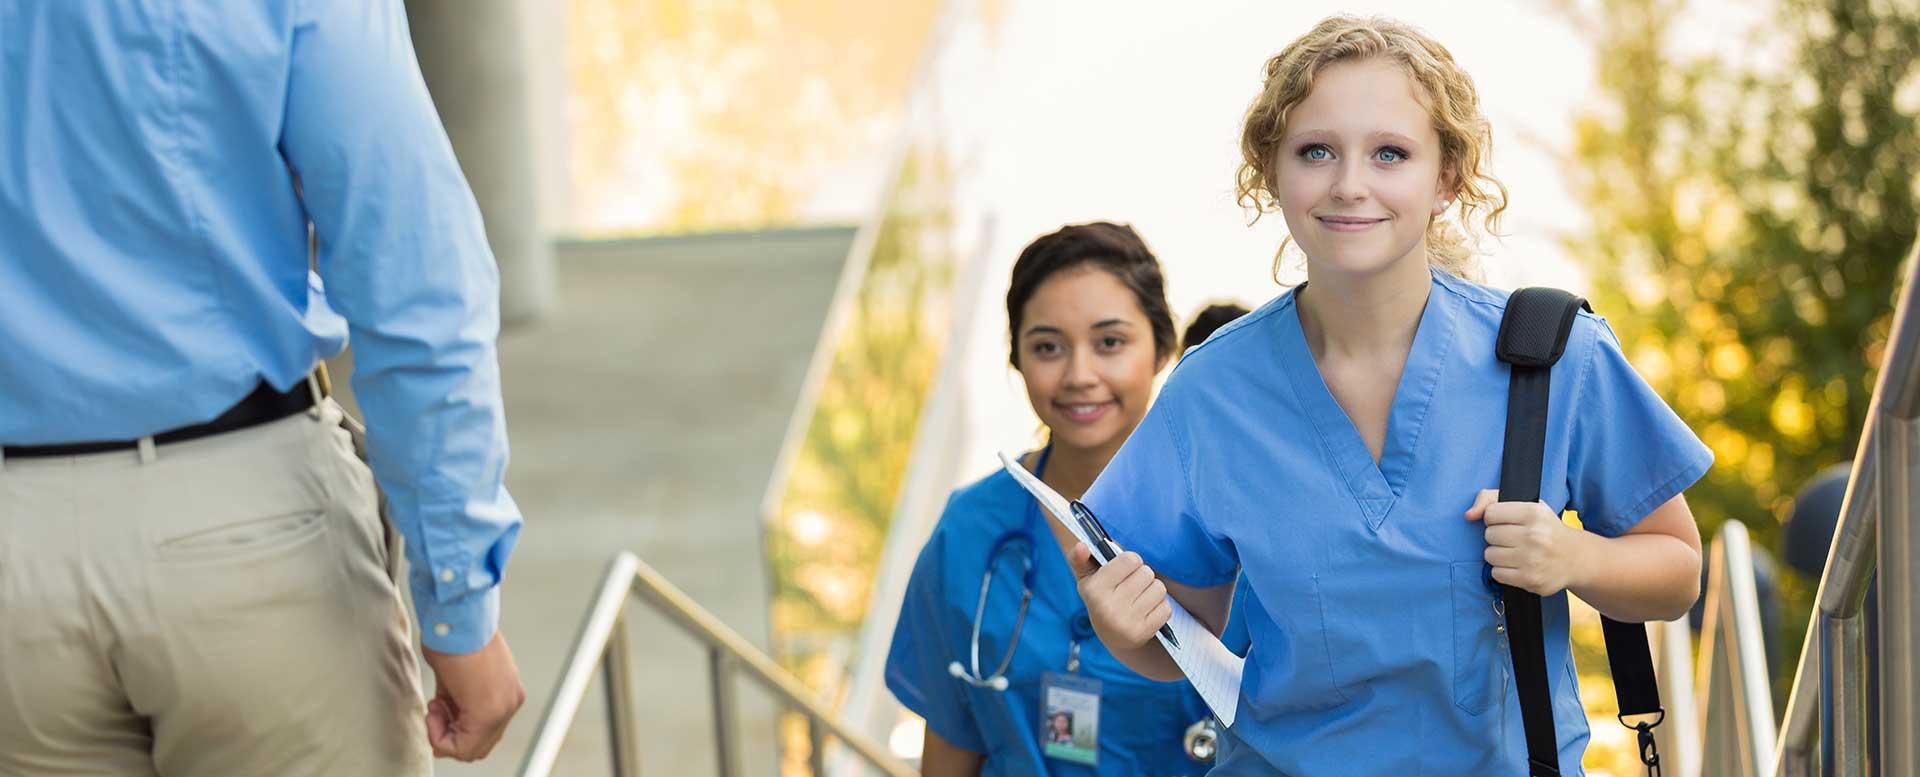 Pflegefachleute